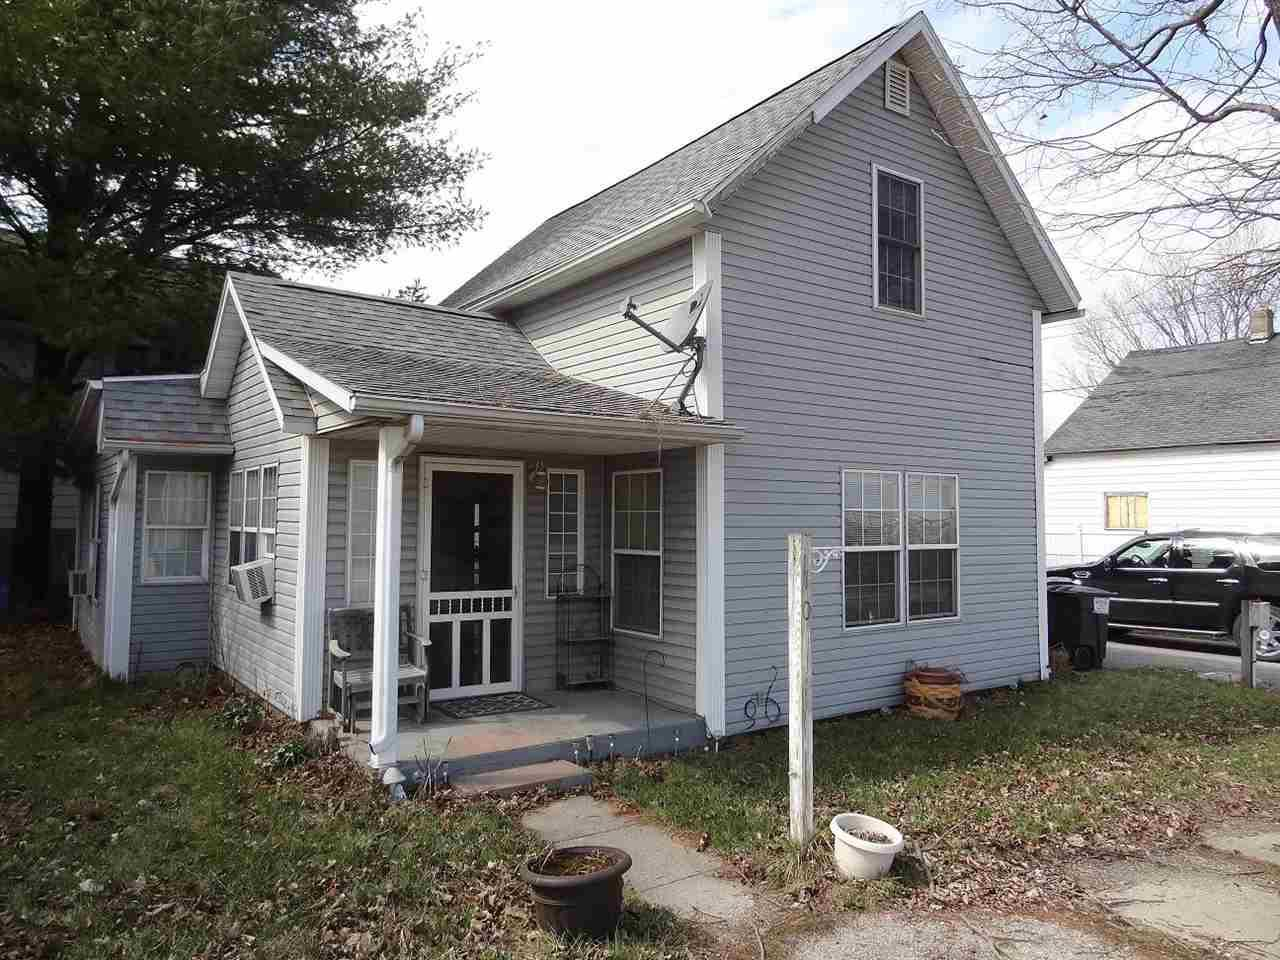 Indiana white county idaville - Indiana White County Idaville 71